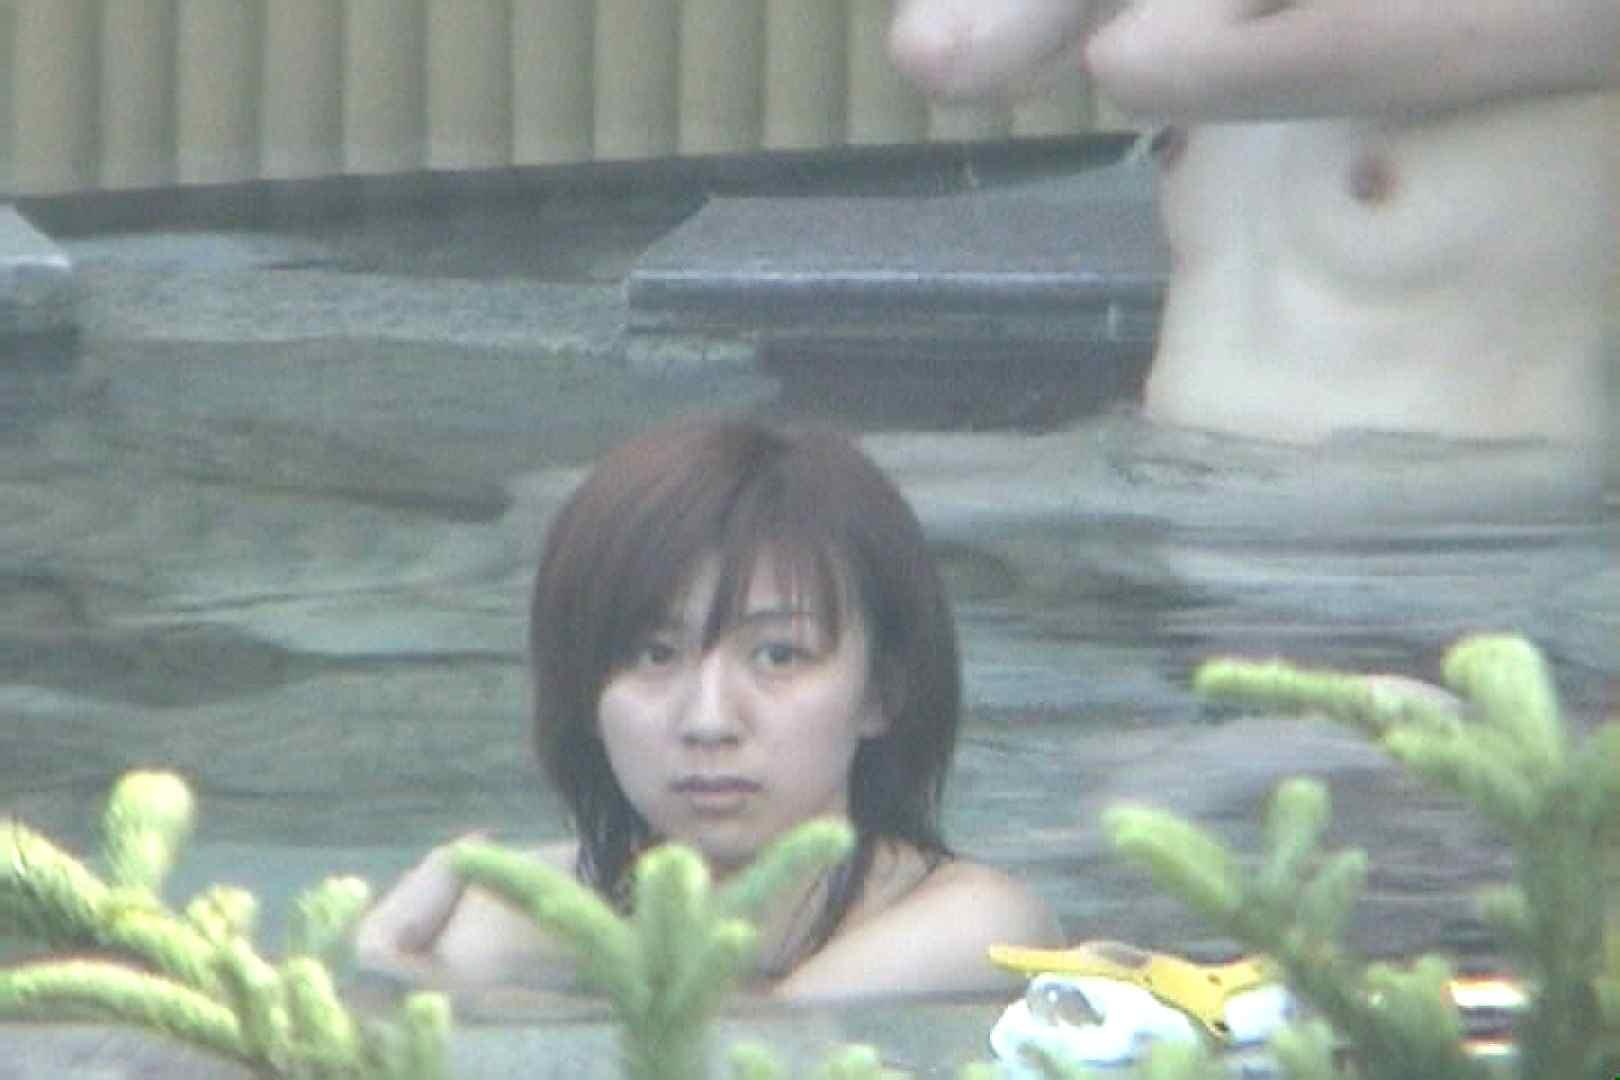 Aquaな露天風呂Vol.77【VIP限定】 露天   盗撮特集  98画像 77